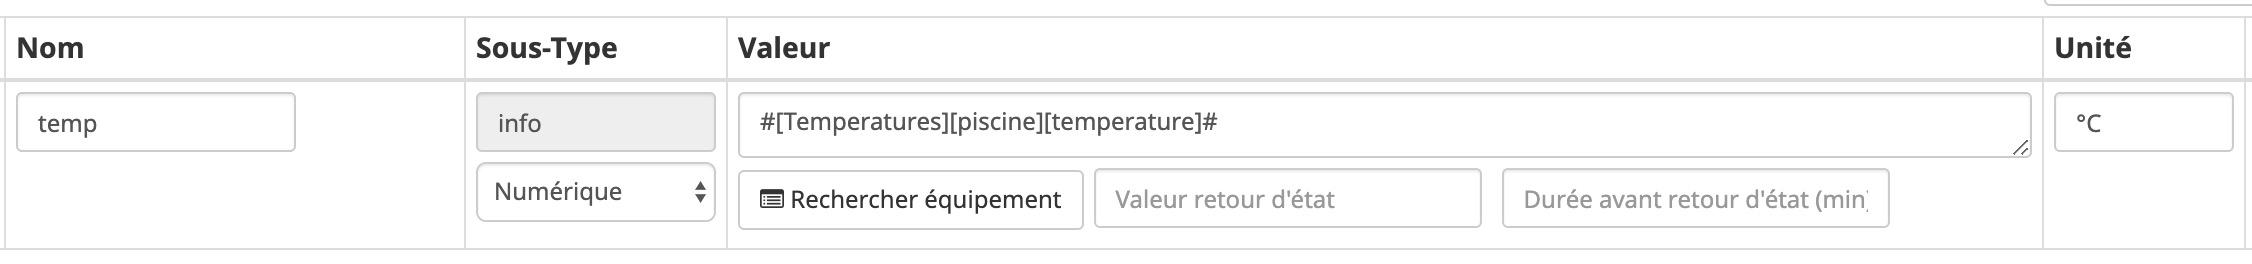 info-virtuel-temerature-eau-jeedom